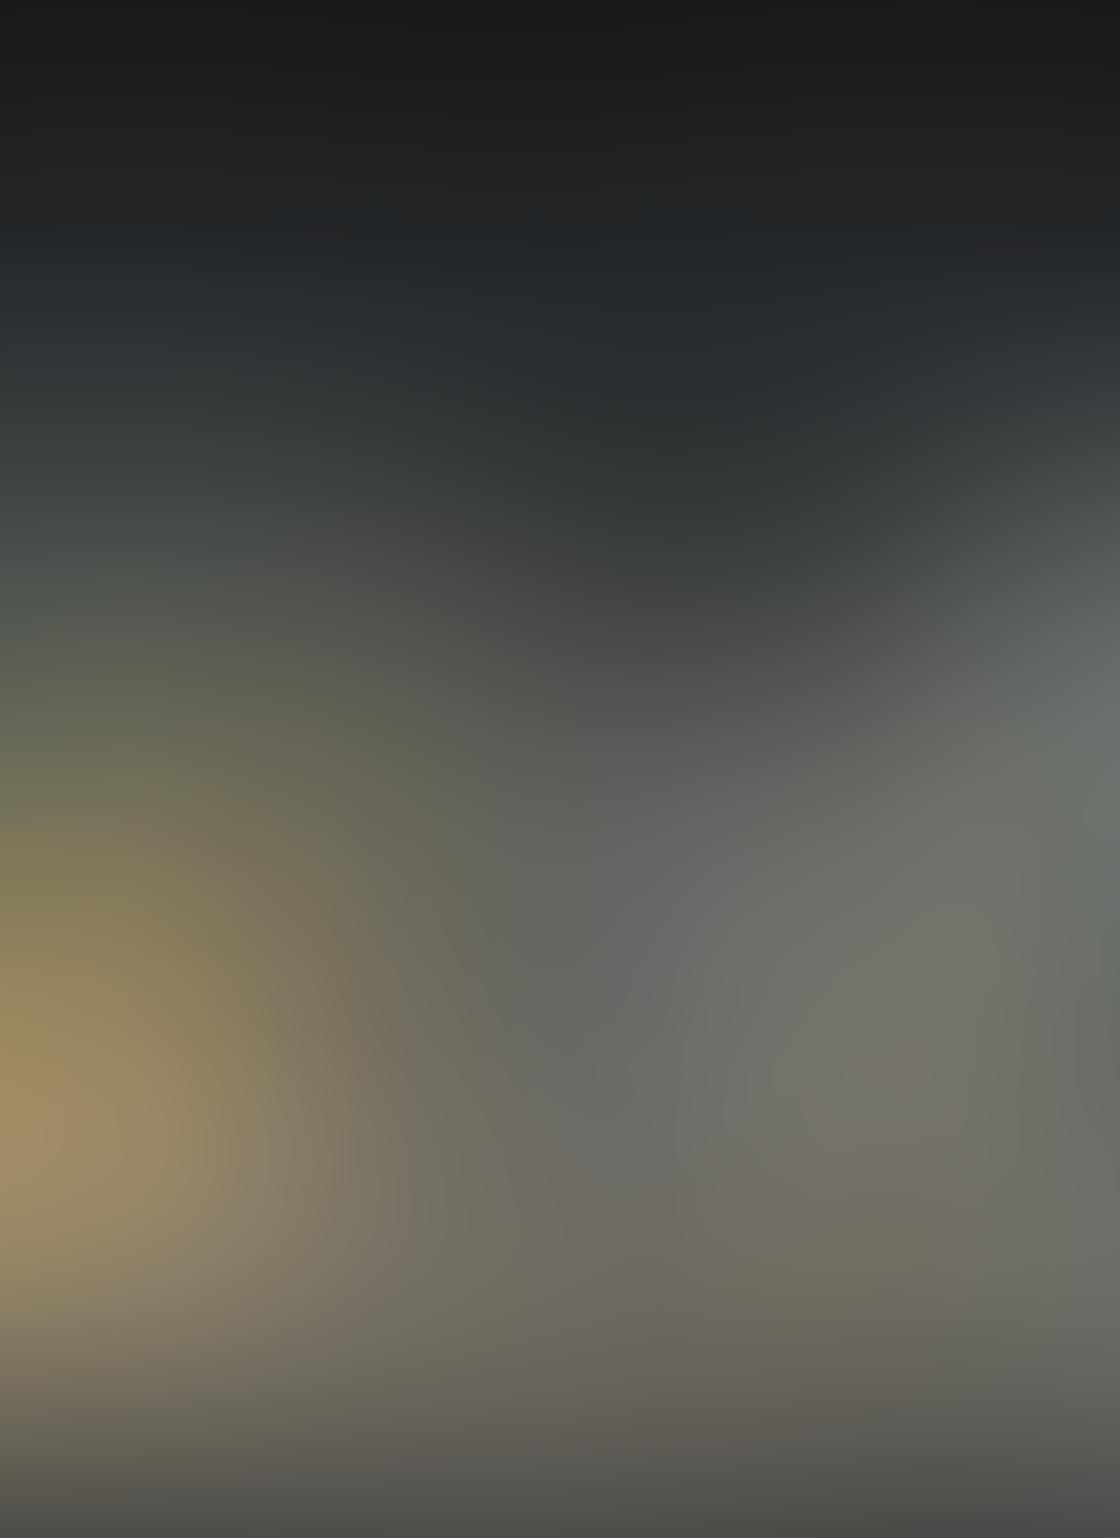 Pixelmator iPhone Editing App 12